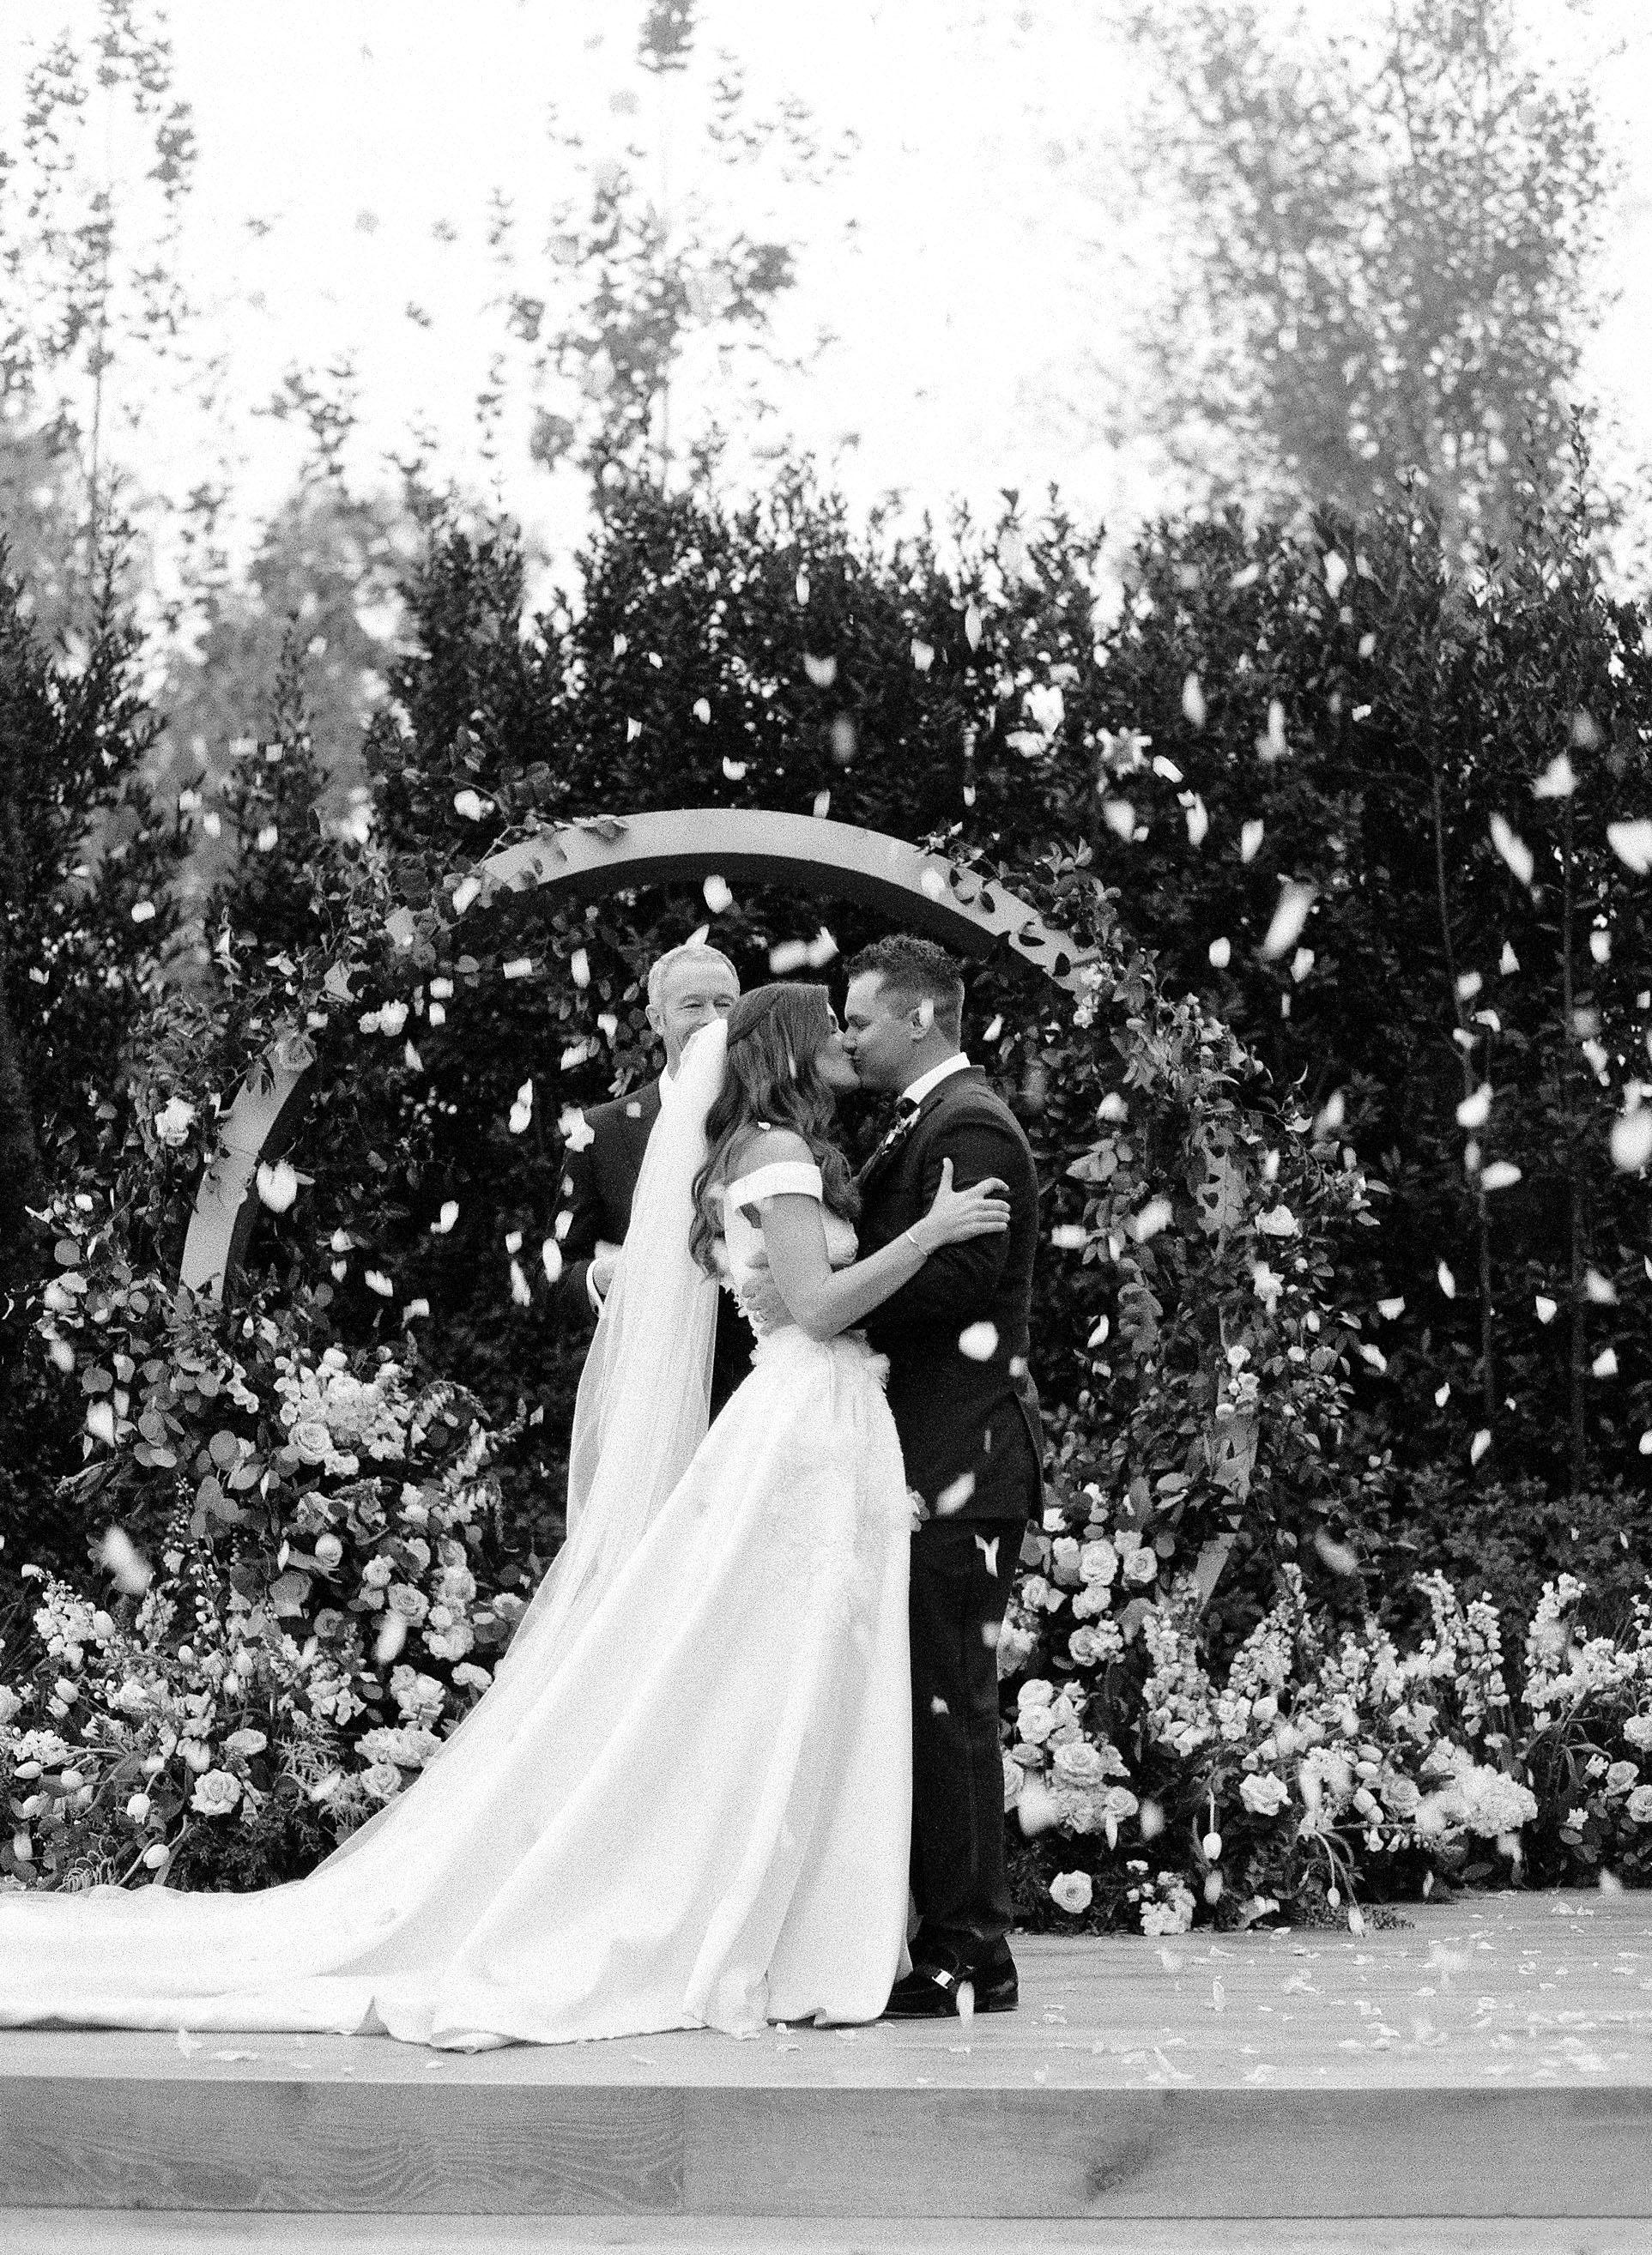 kelsey joc wedding santa barbara california ceremony kiss